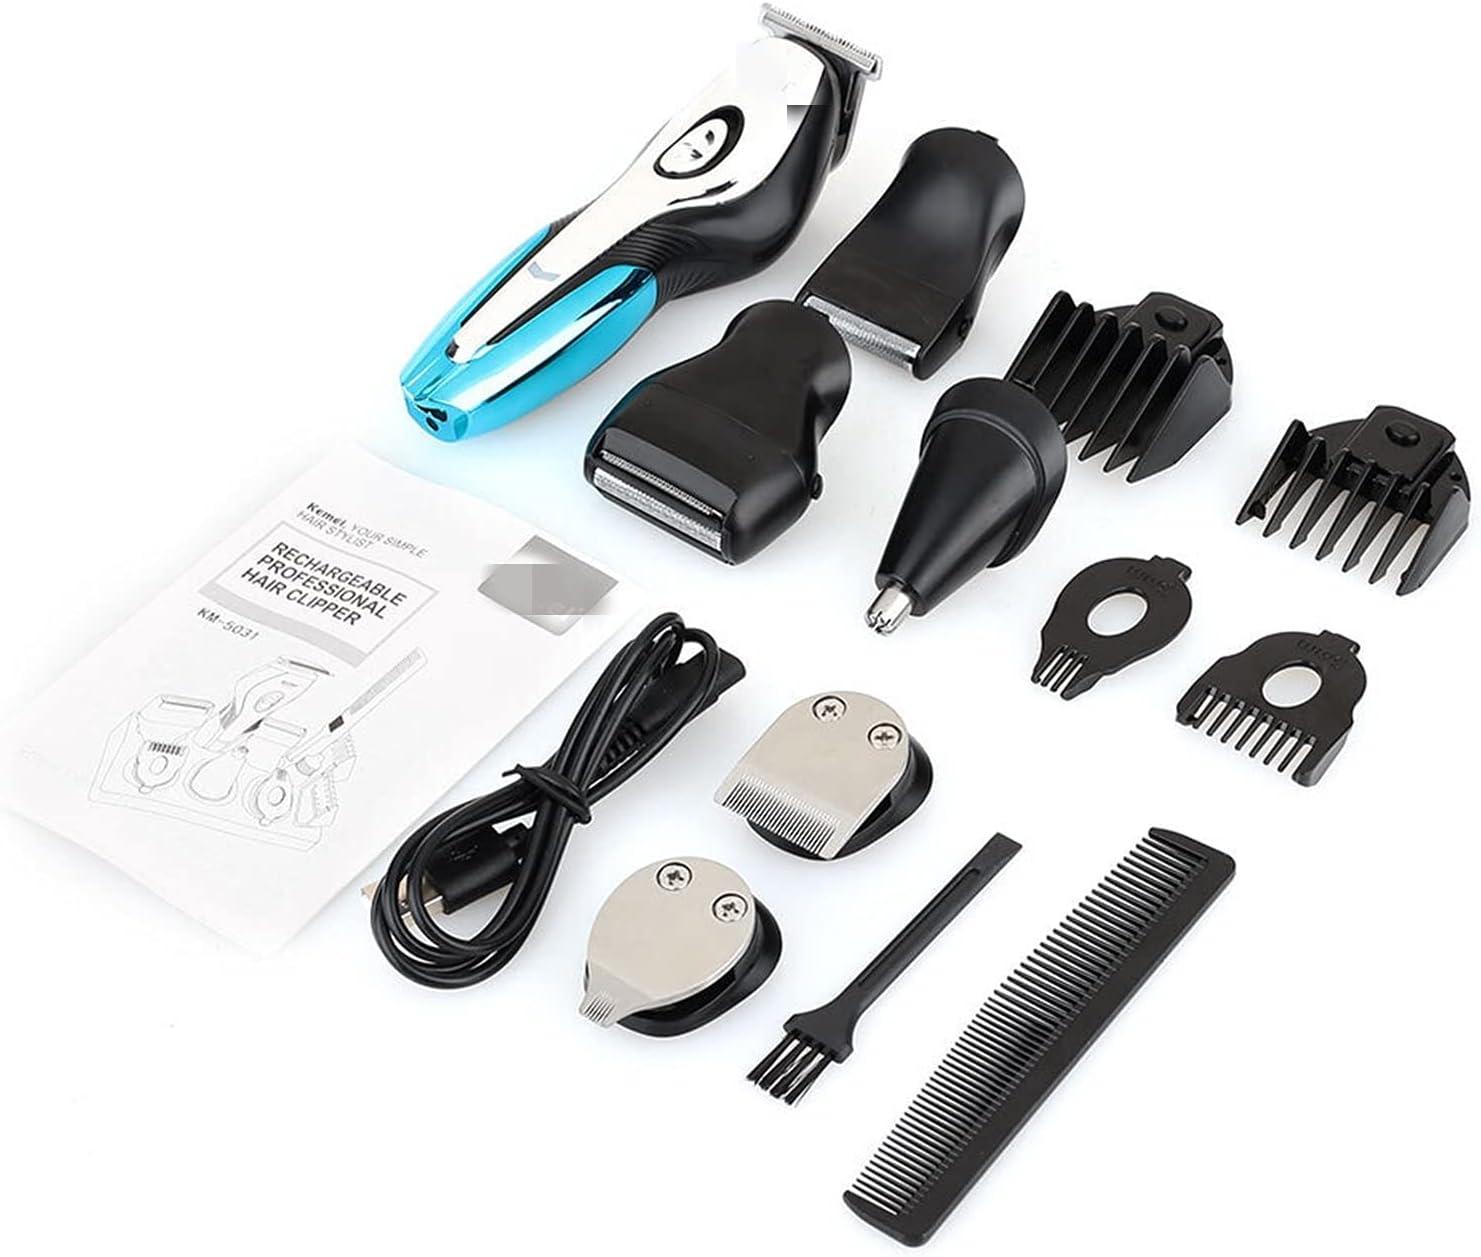 SGADSH Hair Columbus Mall 40% OFF Cheap Sale Clippers Men Men's Electri Clipper Professional